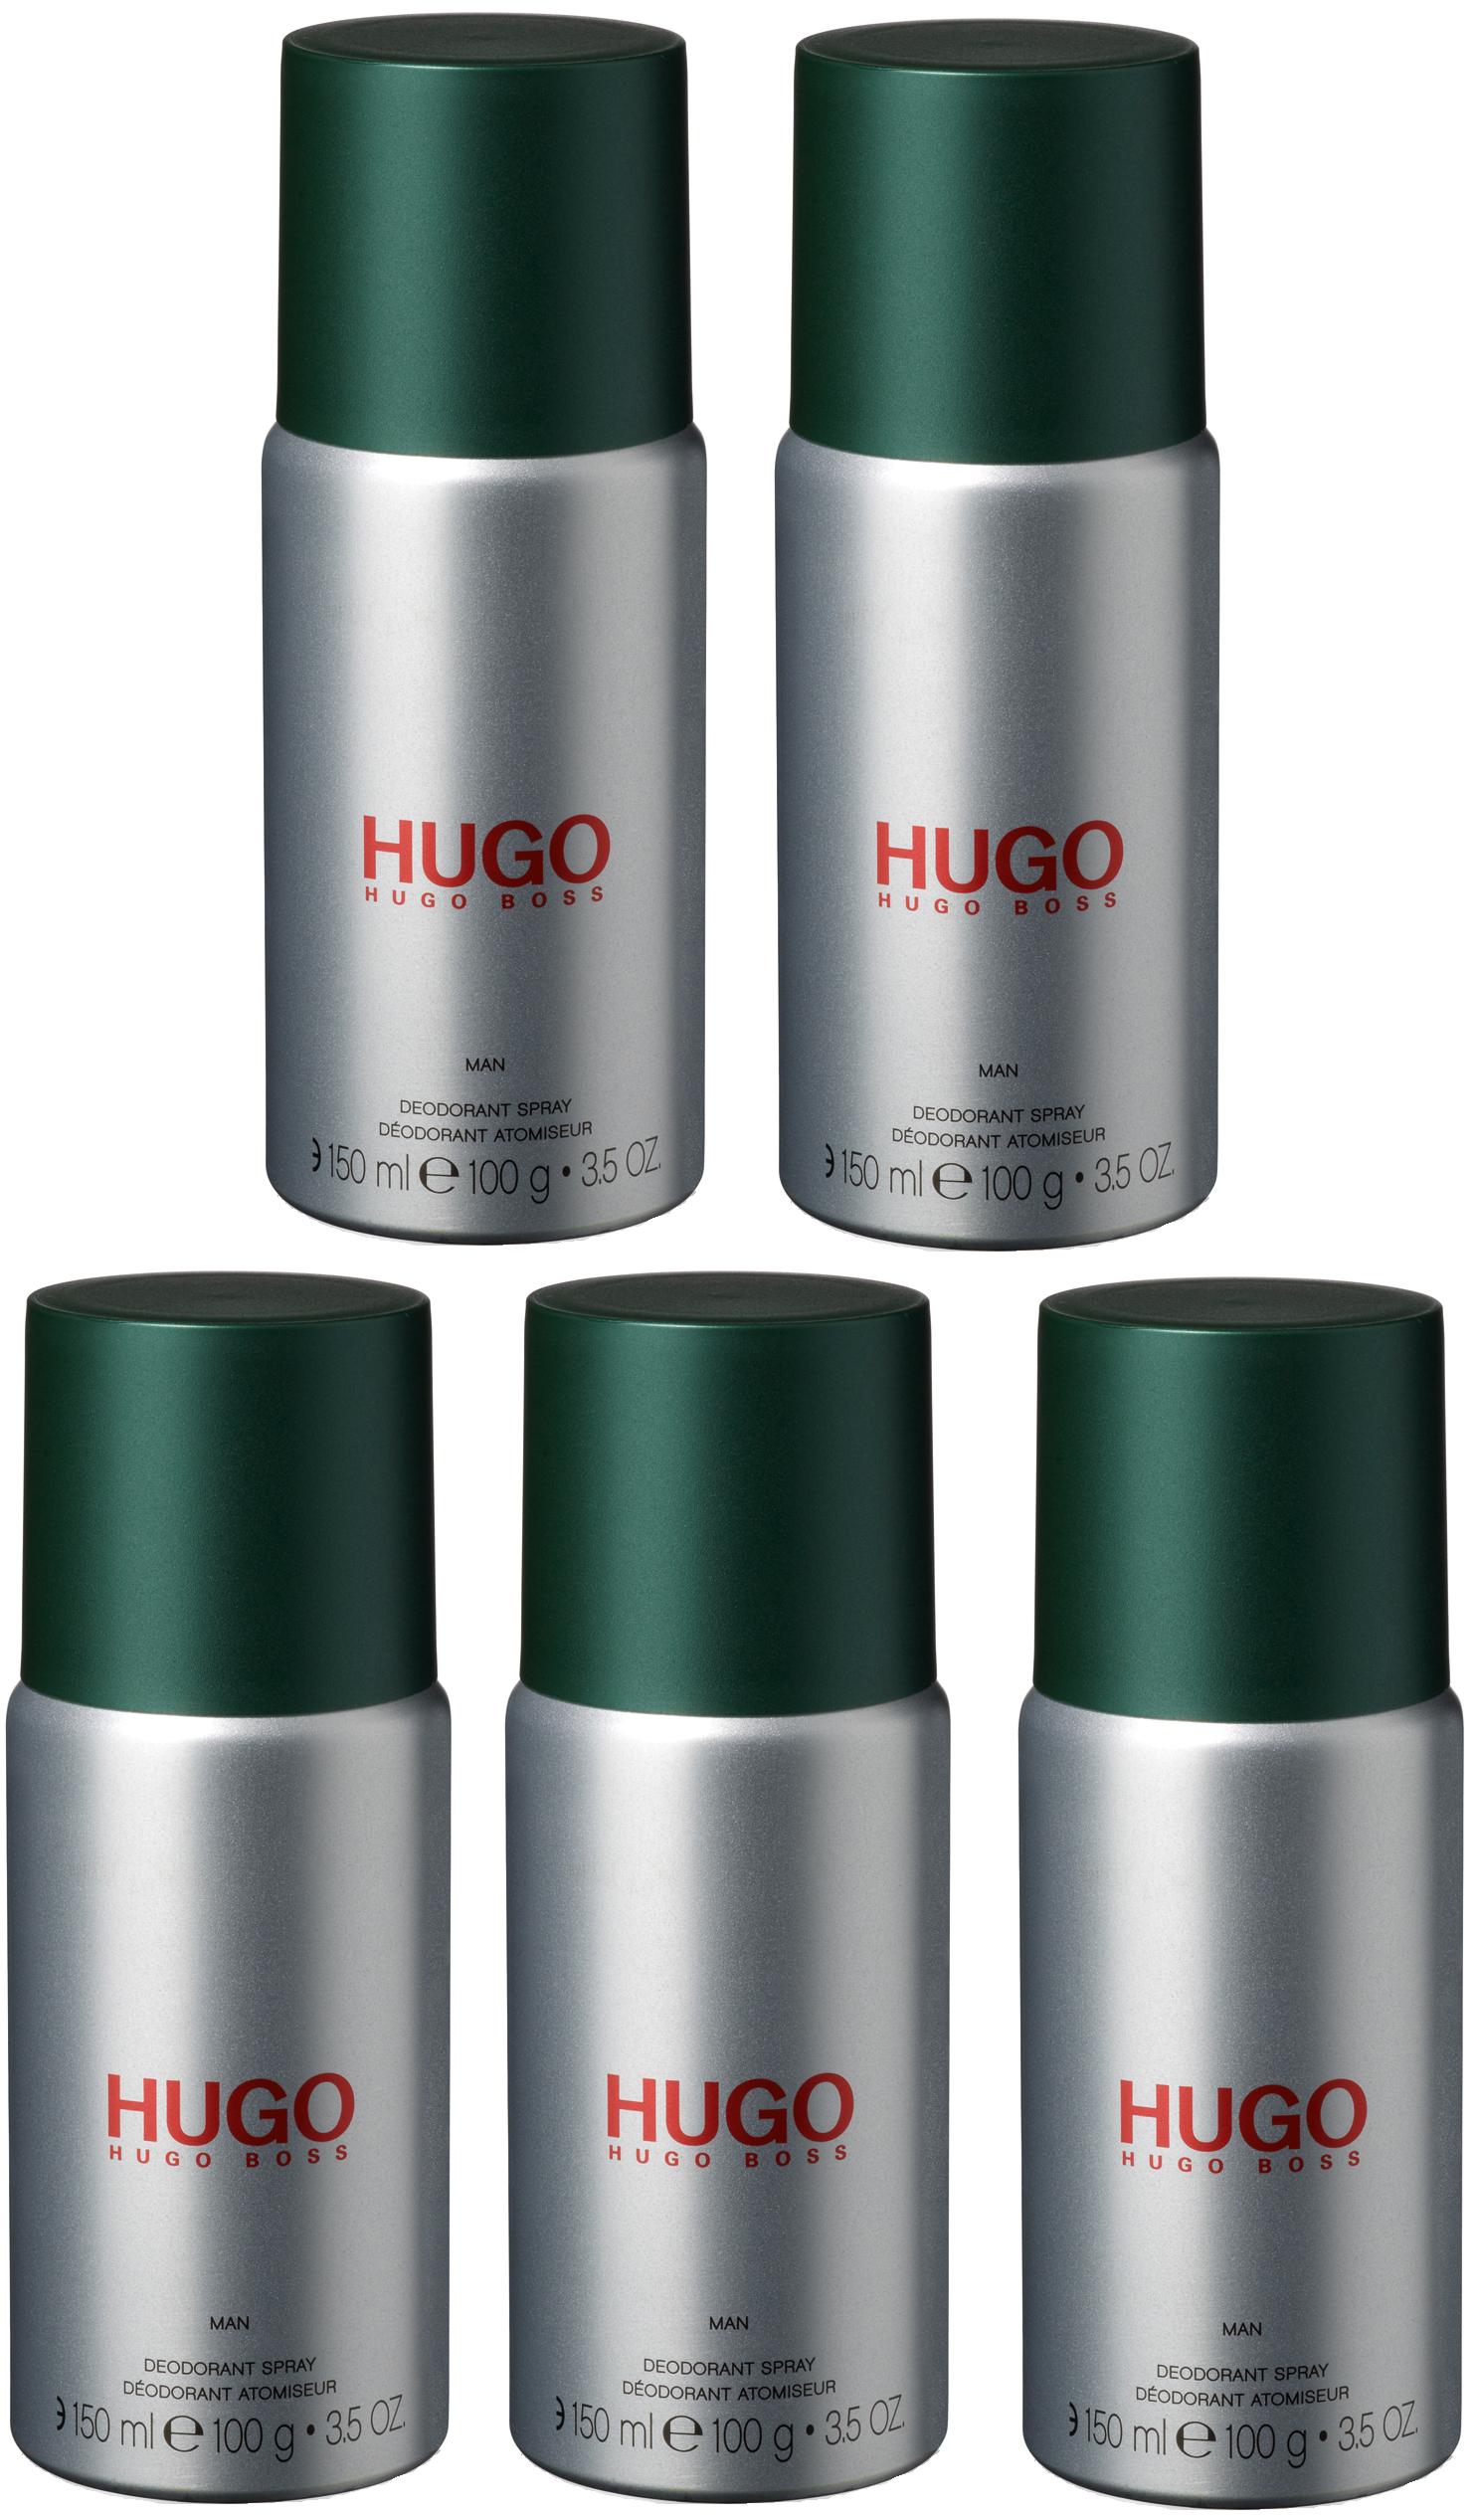 Hugo Boss - 5x Hugo Man Deodorant Spray